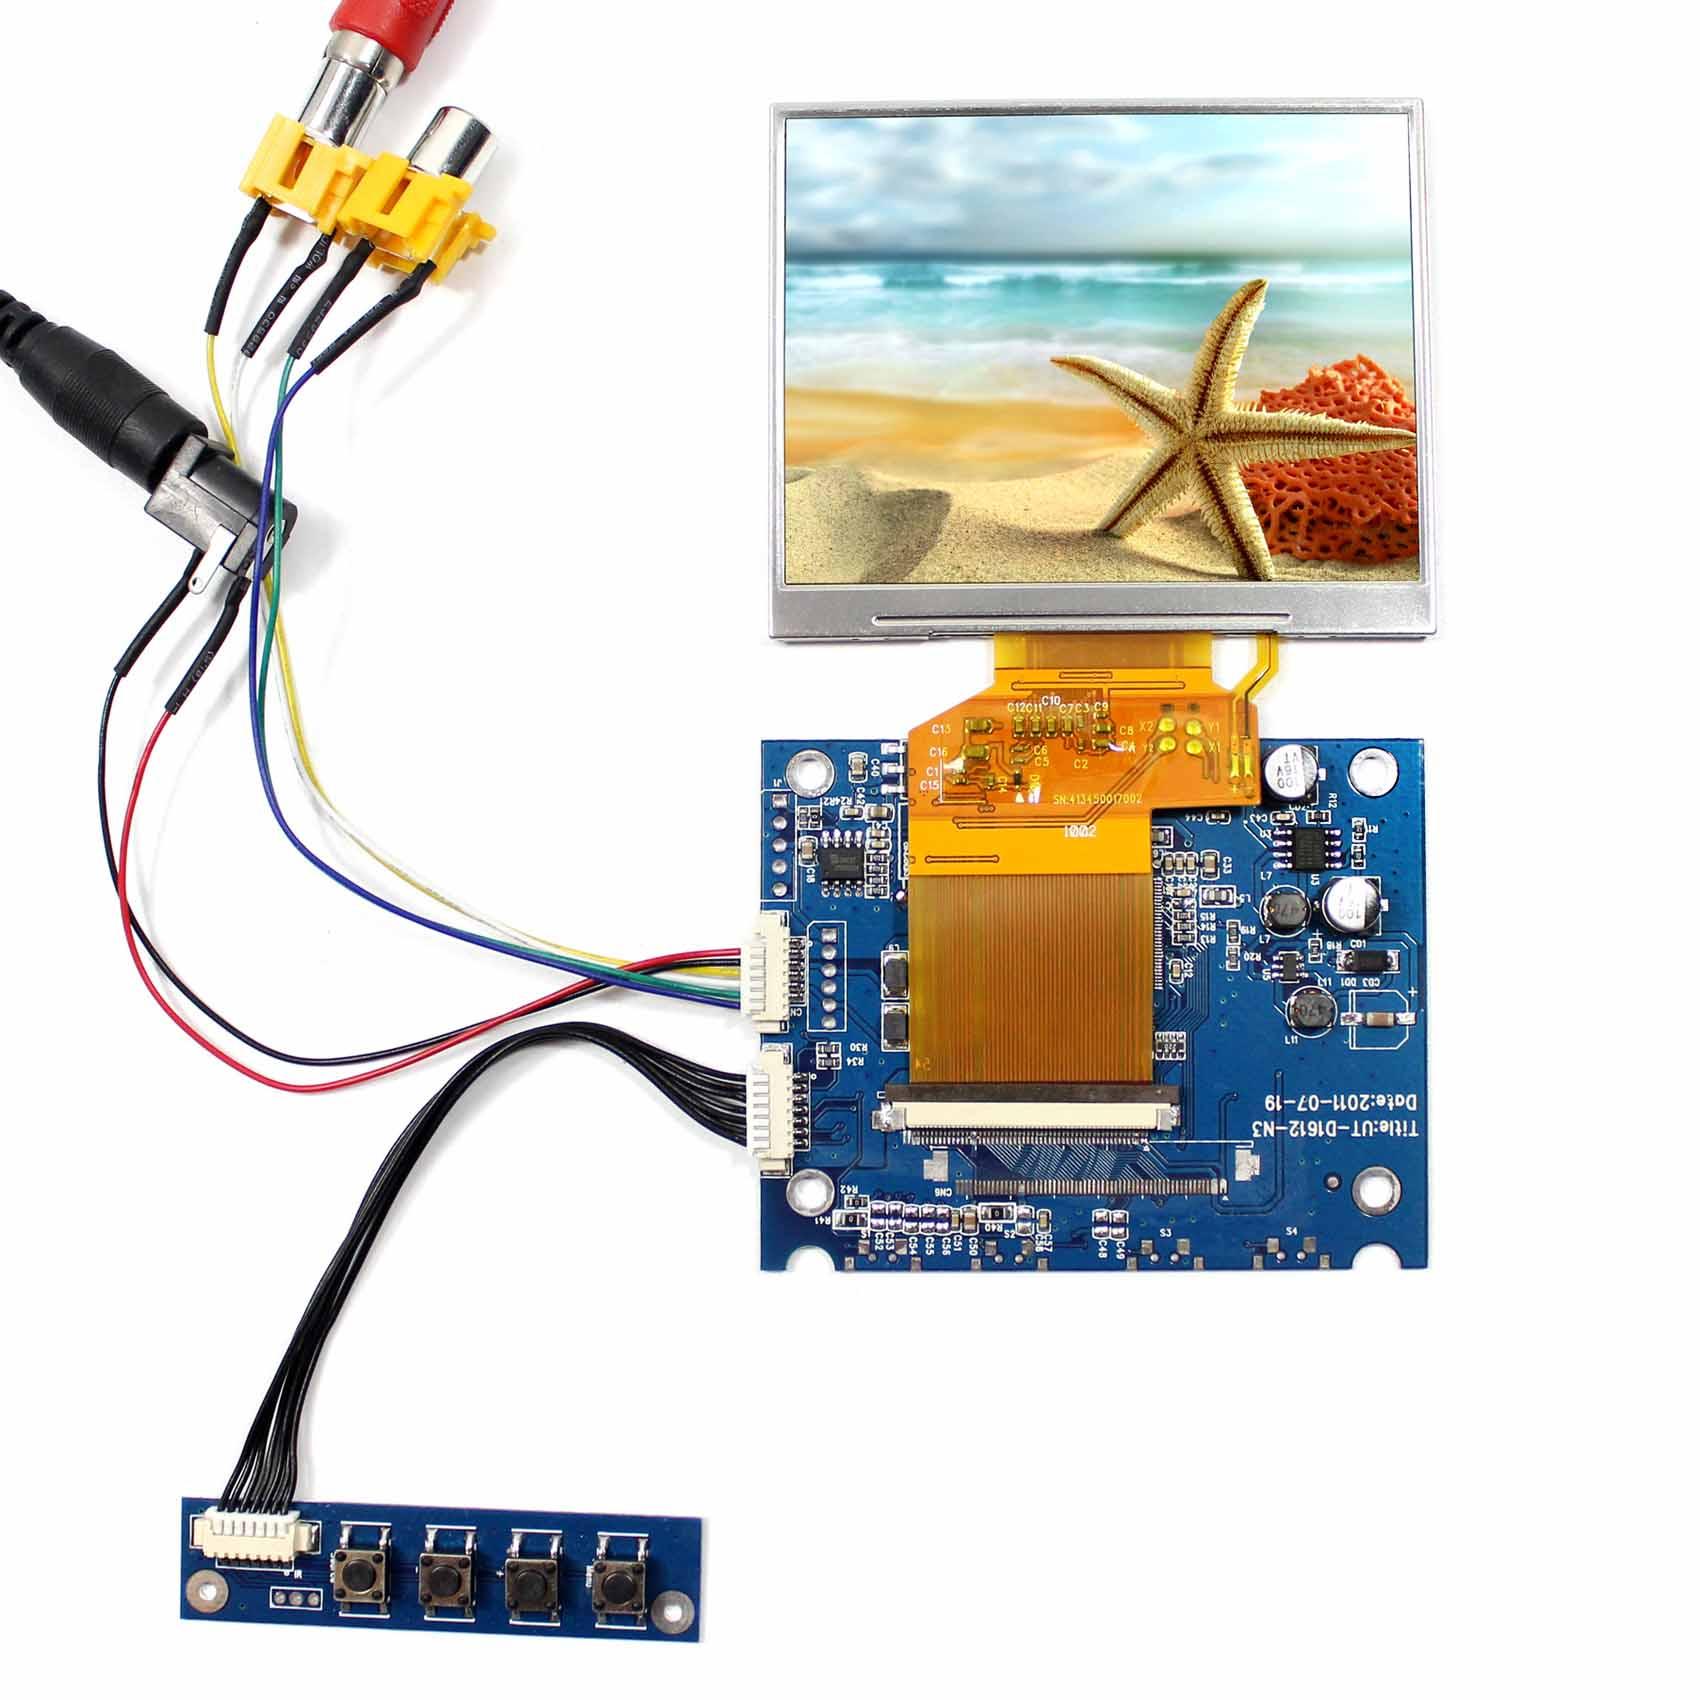 3.5inch LQ035NC111 320x240 LCD Screen with 2AV LCD Driver Board VS-D1612-N3